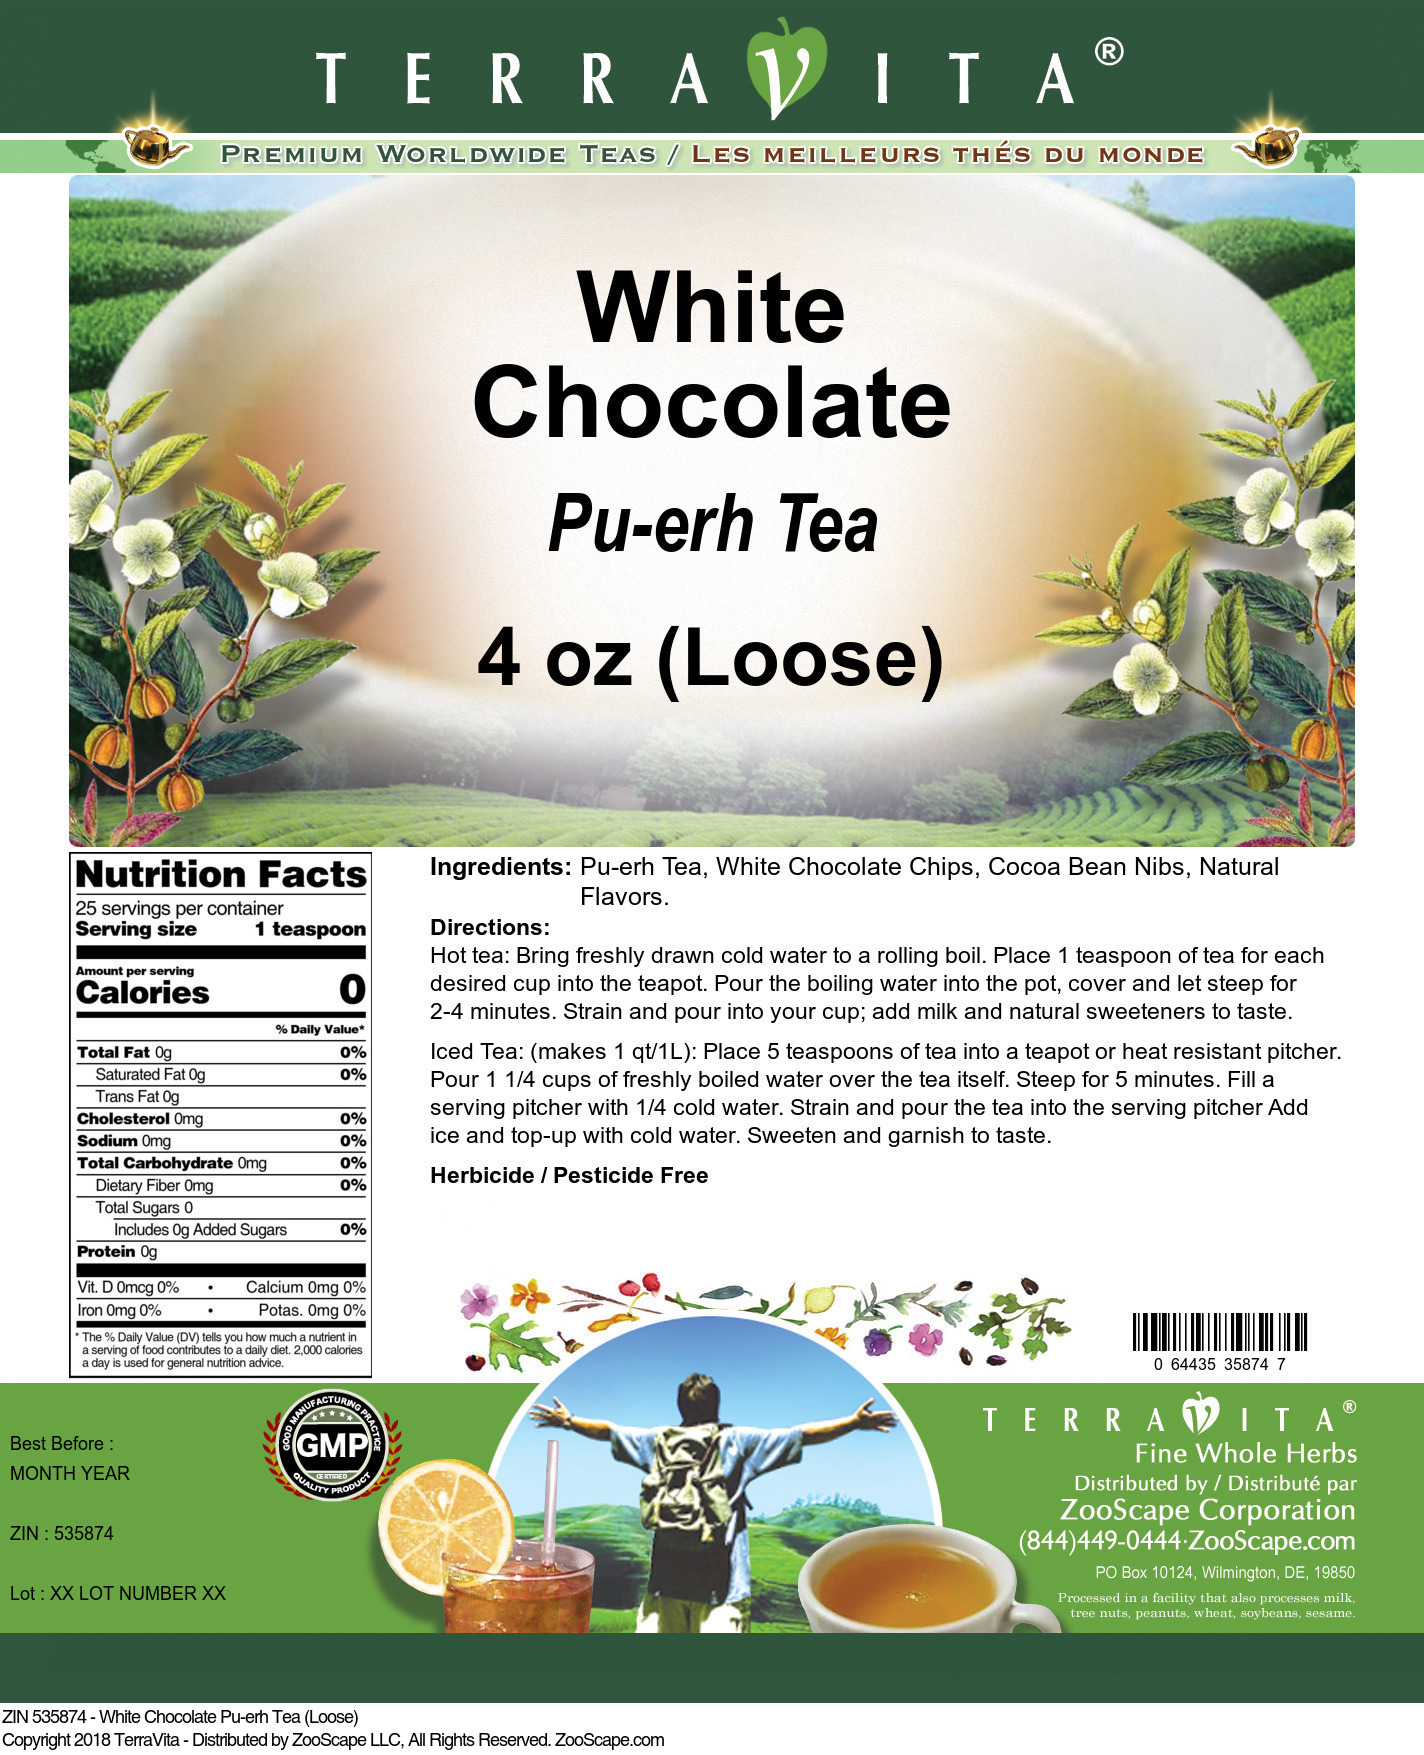 White Chocolate Pu-erh Tea (Loose)